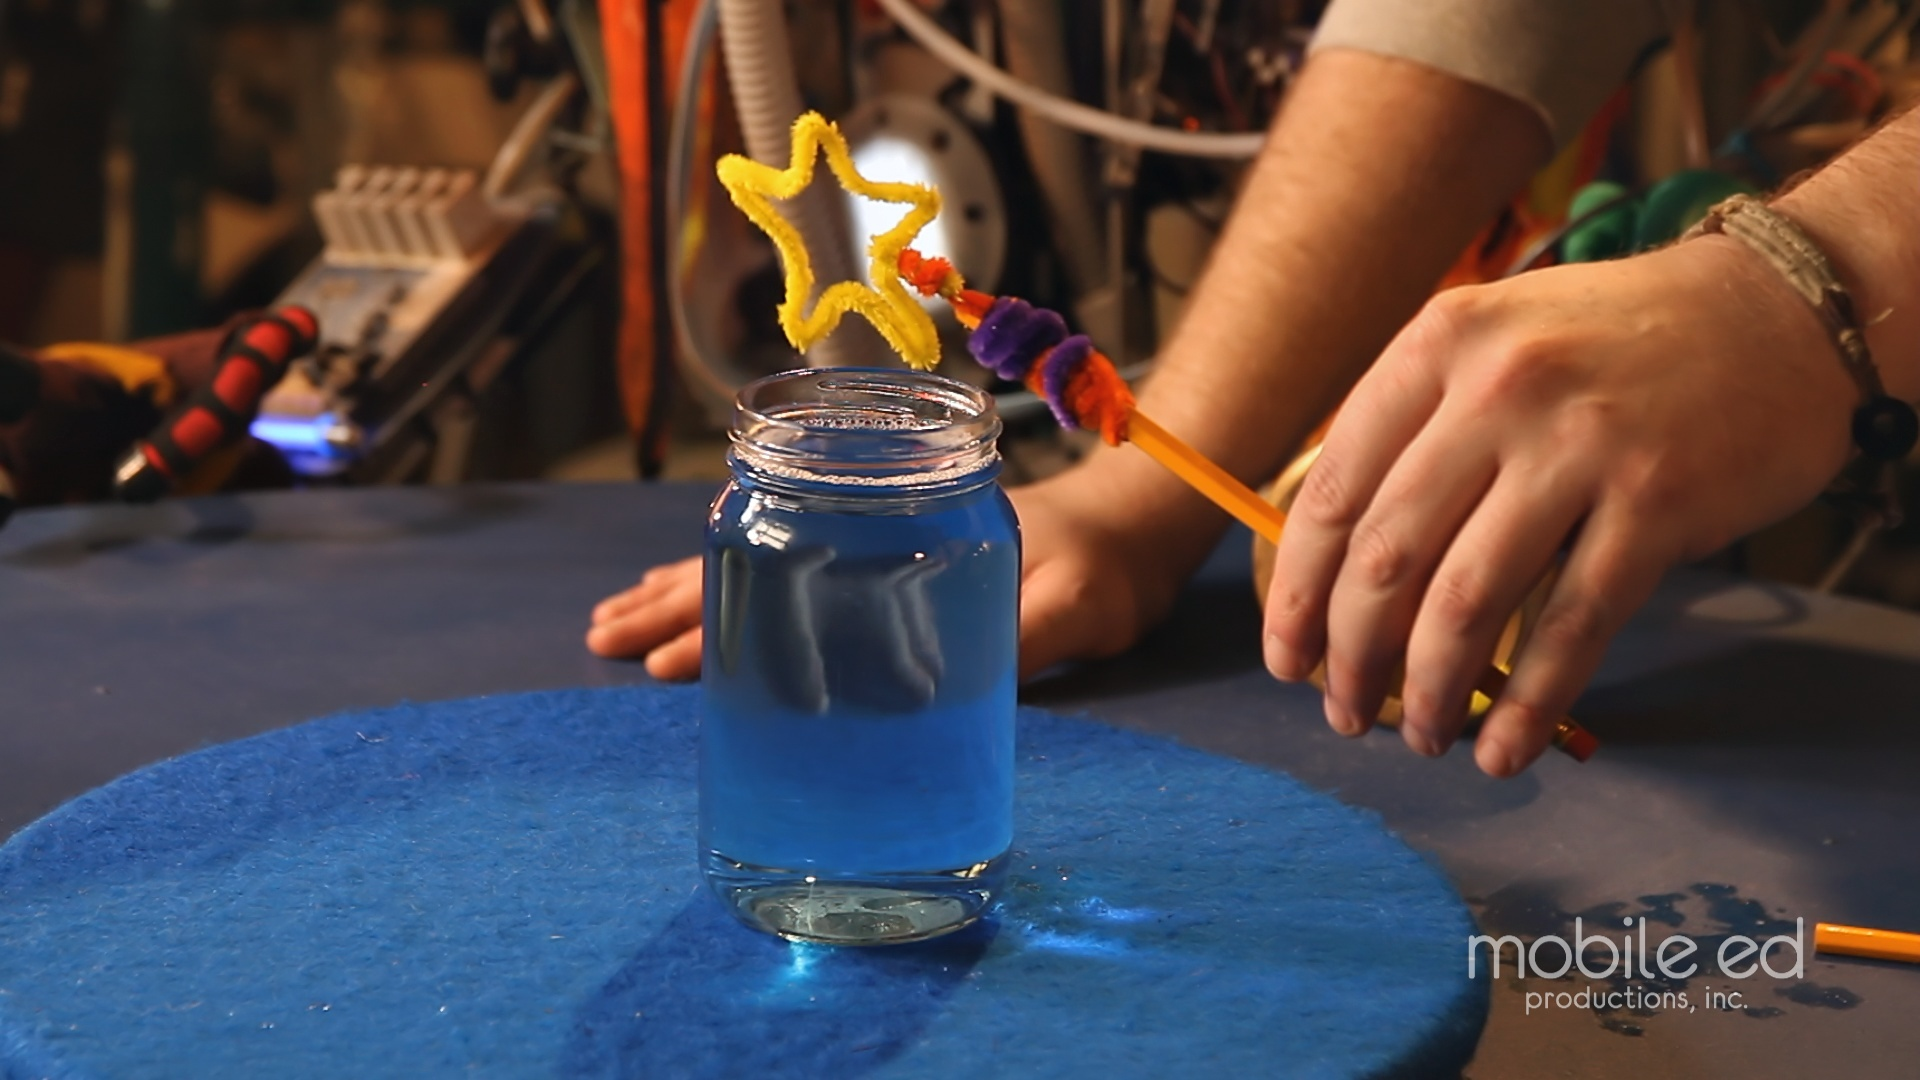 Get ready to blow bubbles | Handy Dan the Junkyard Man | Mobile Ed Productions